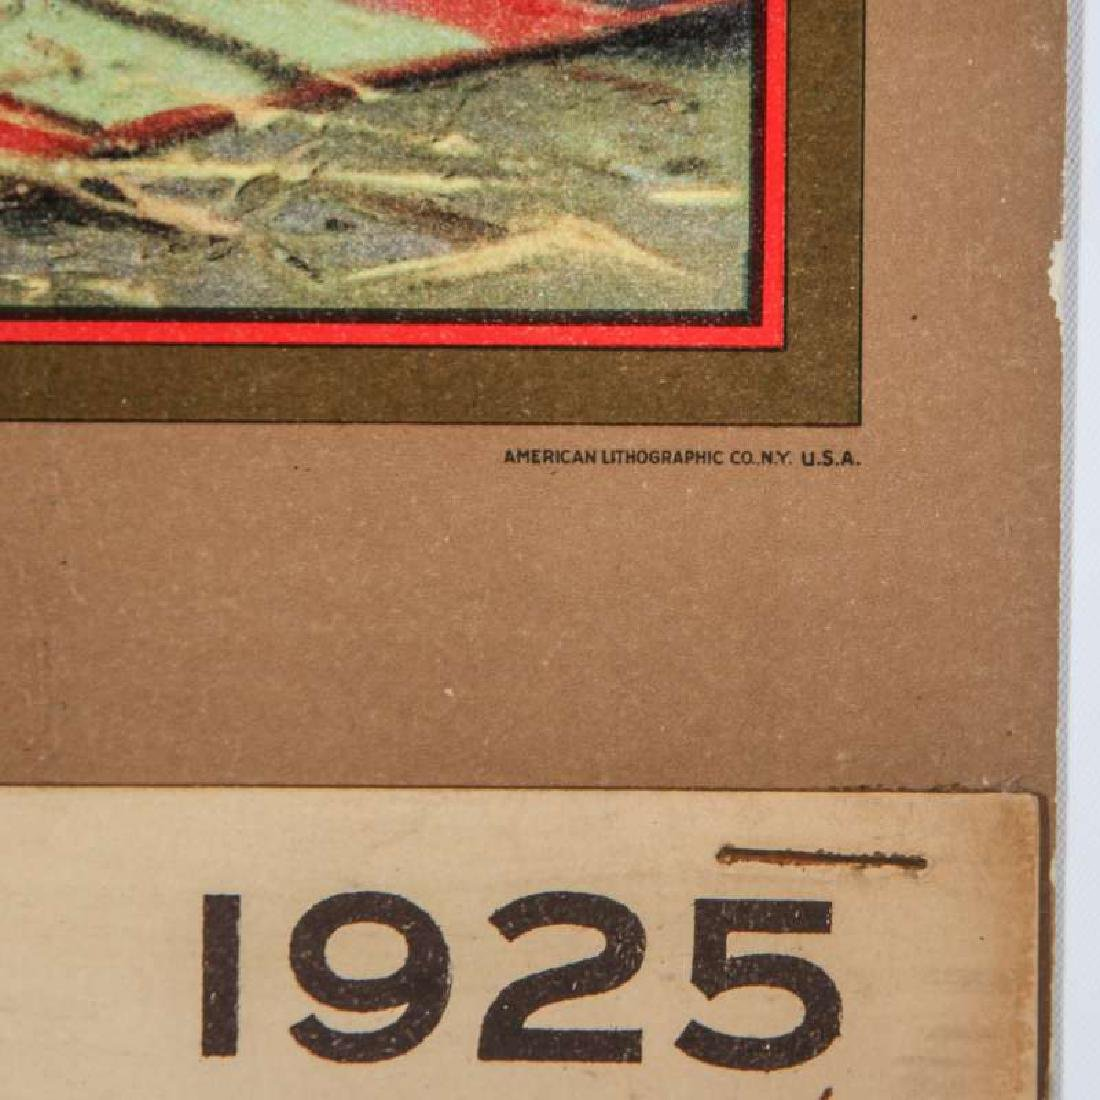 1925 SANTA FE RR E.I. COUSE CALENDAR WITH FULL PAD - 6